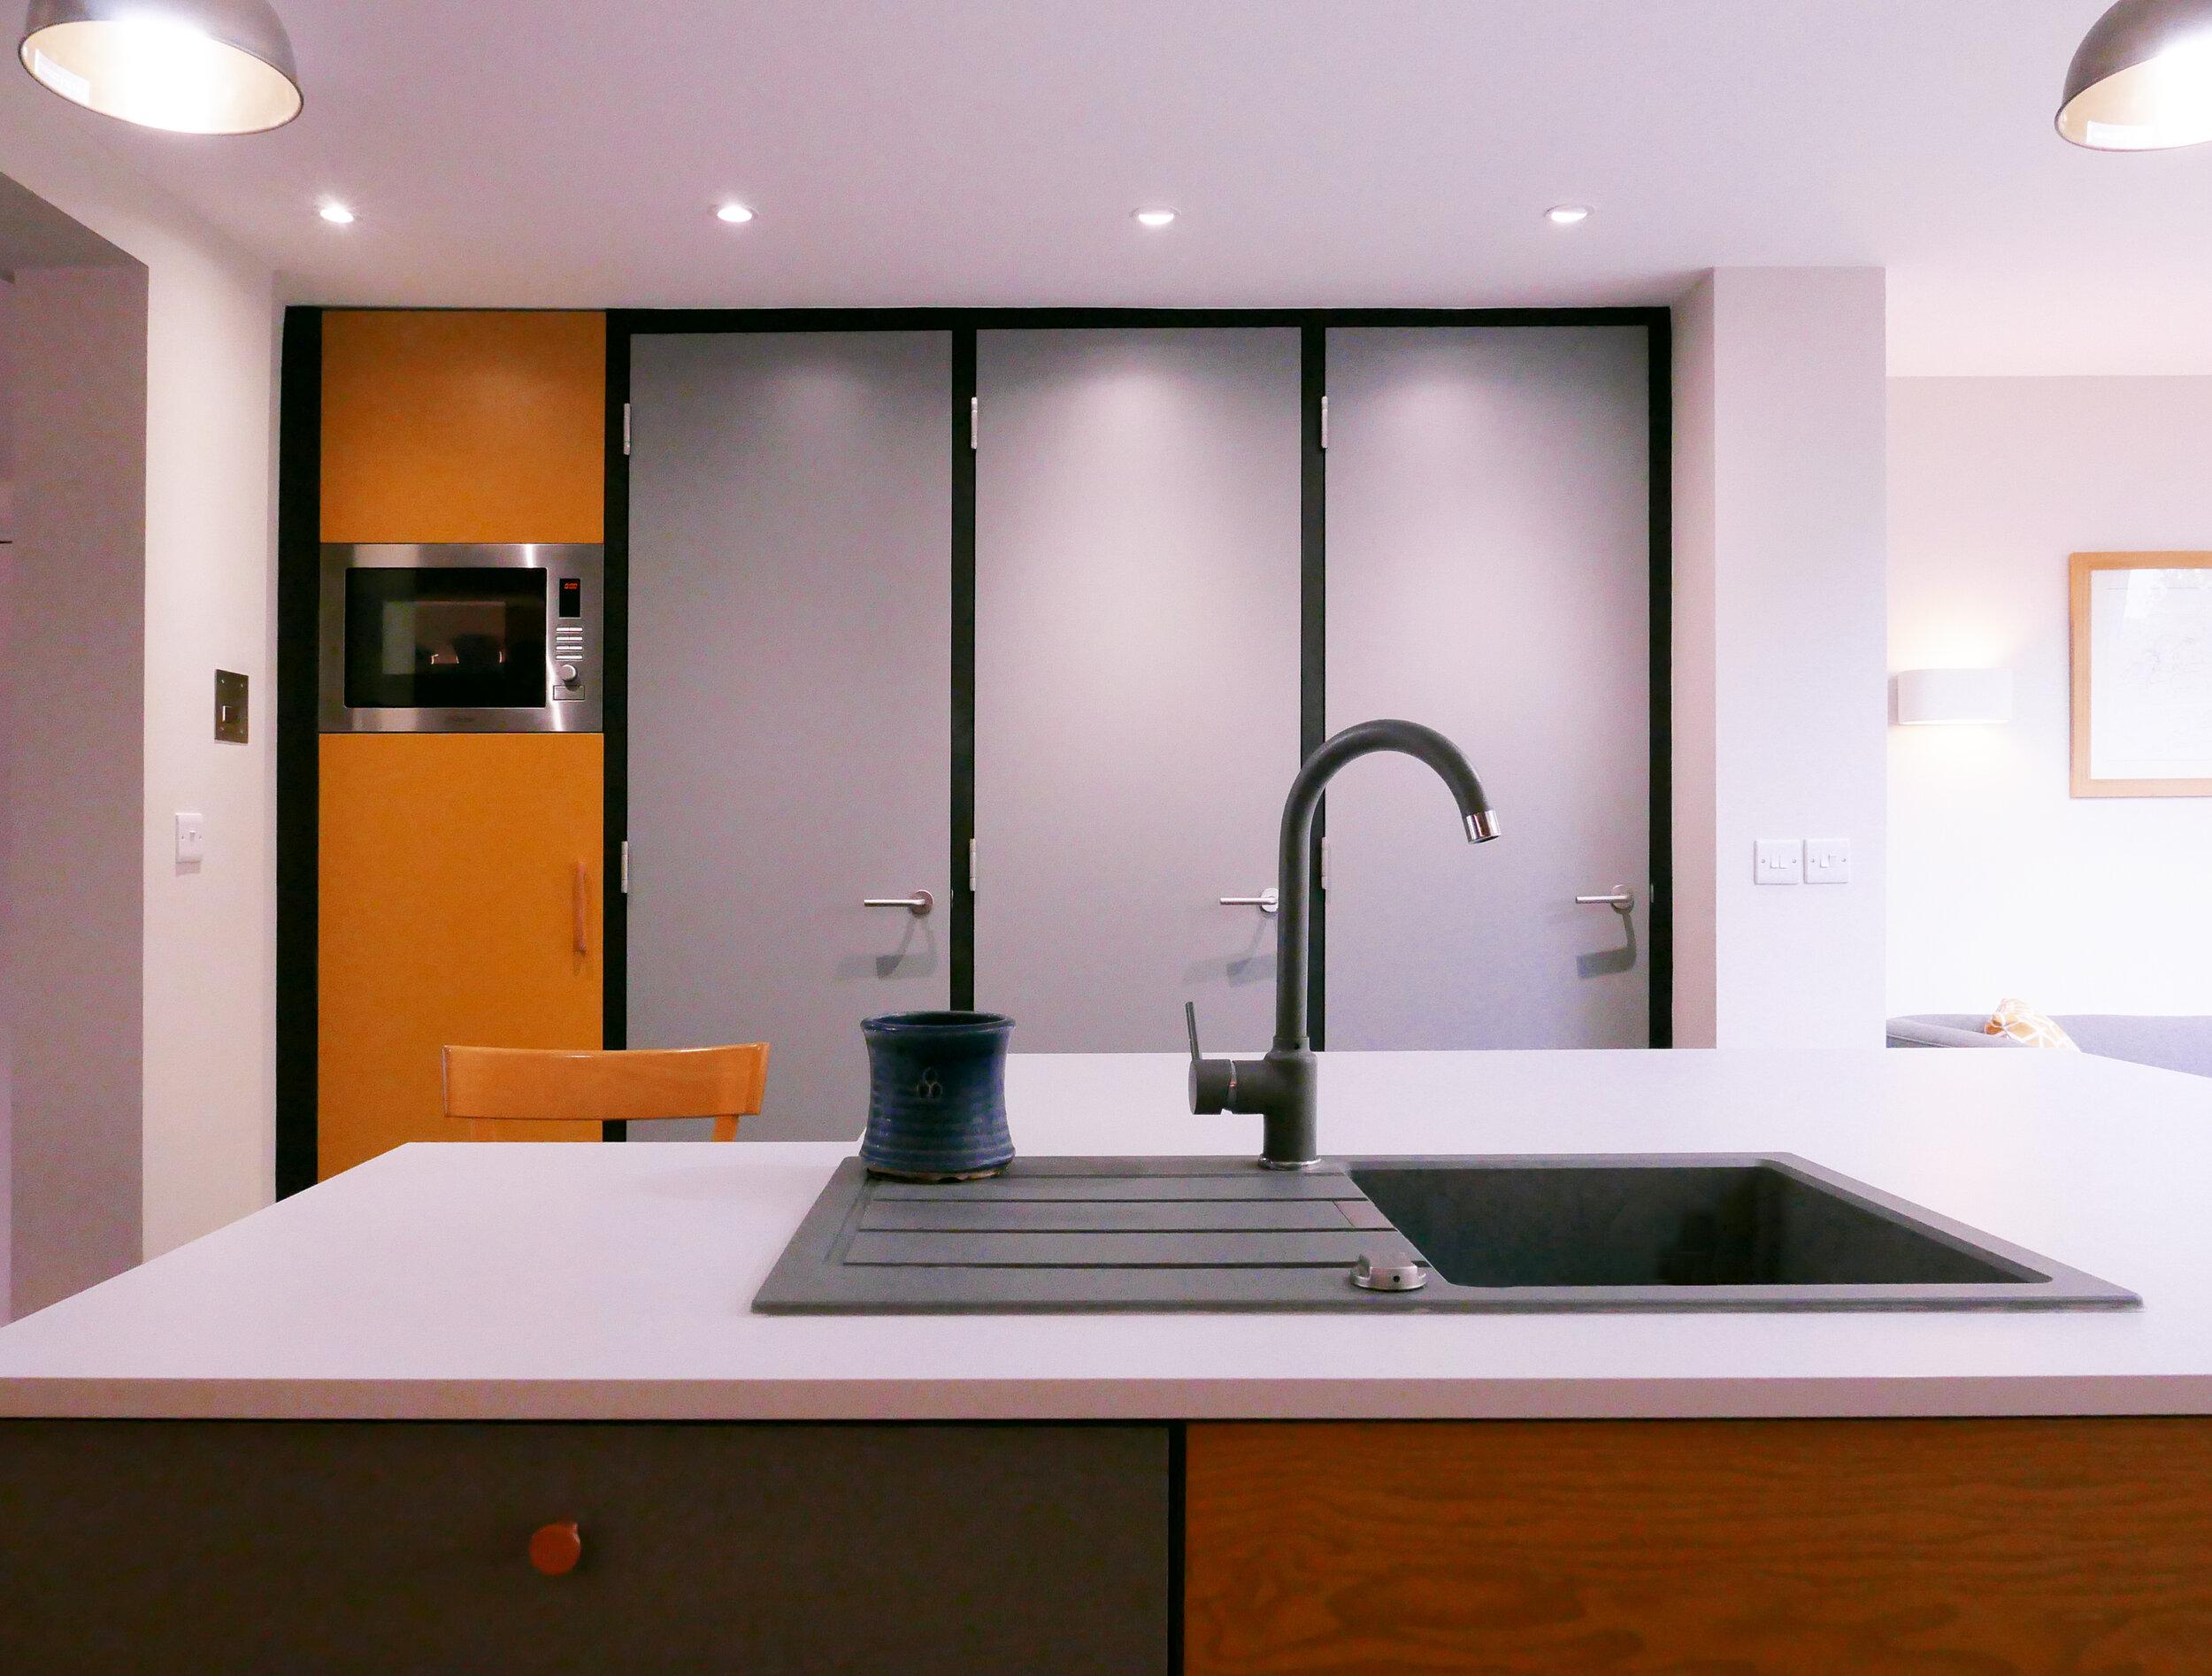 RetroFirst D line ironmongery Handles on Re-clad Fire Doors Utility Wall Design